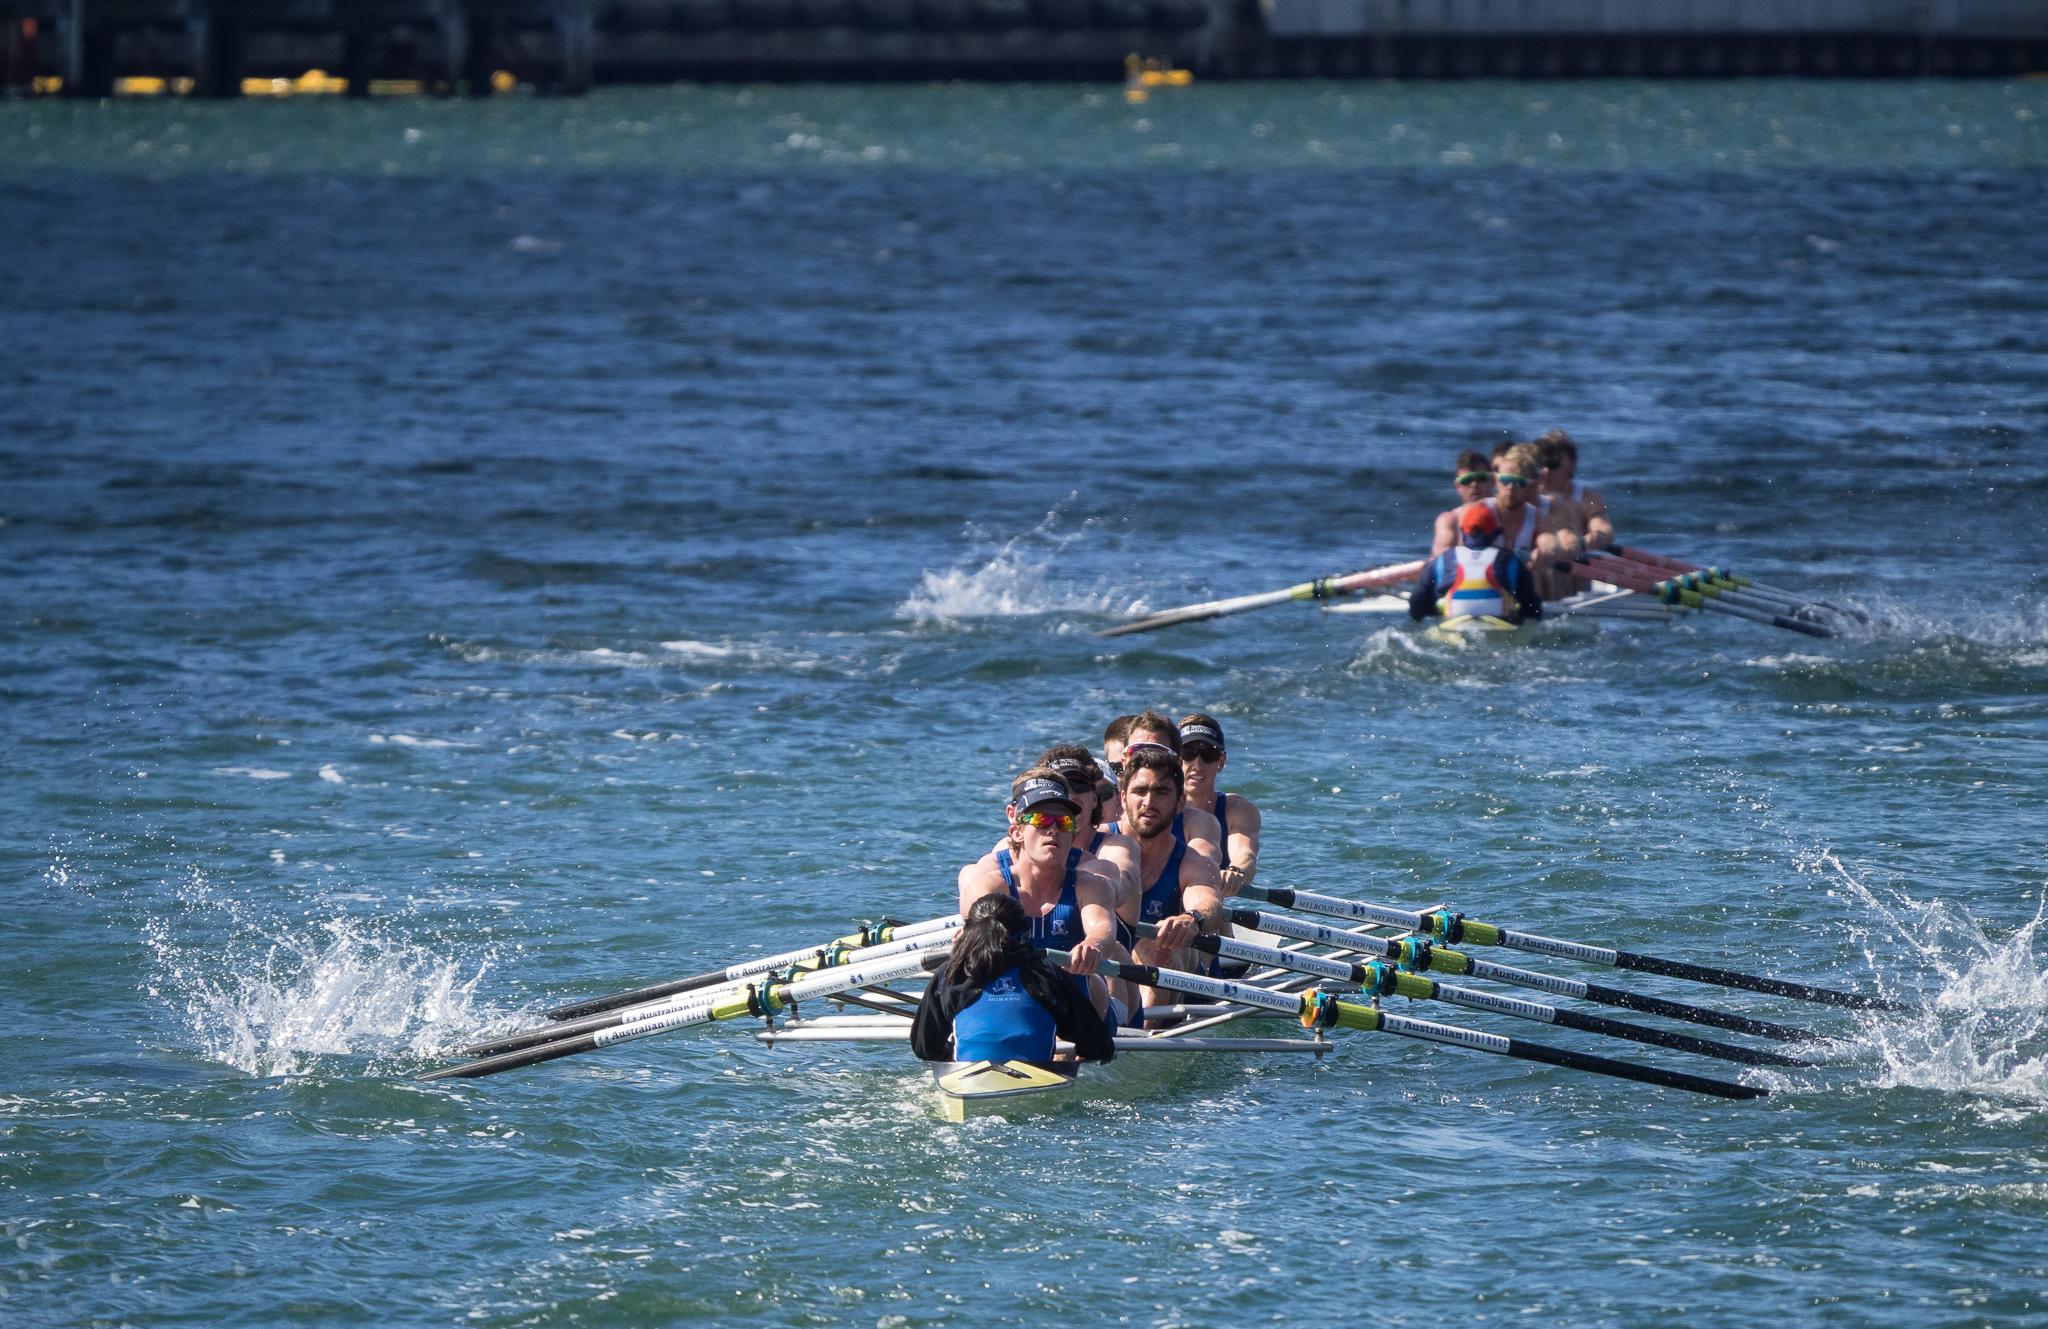 Boat Race 2016-15. Alan Shawjpg (13).jpg